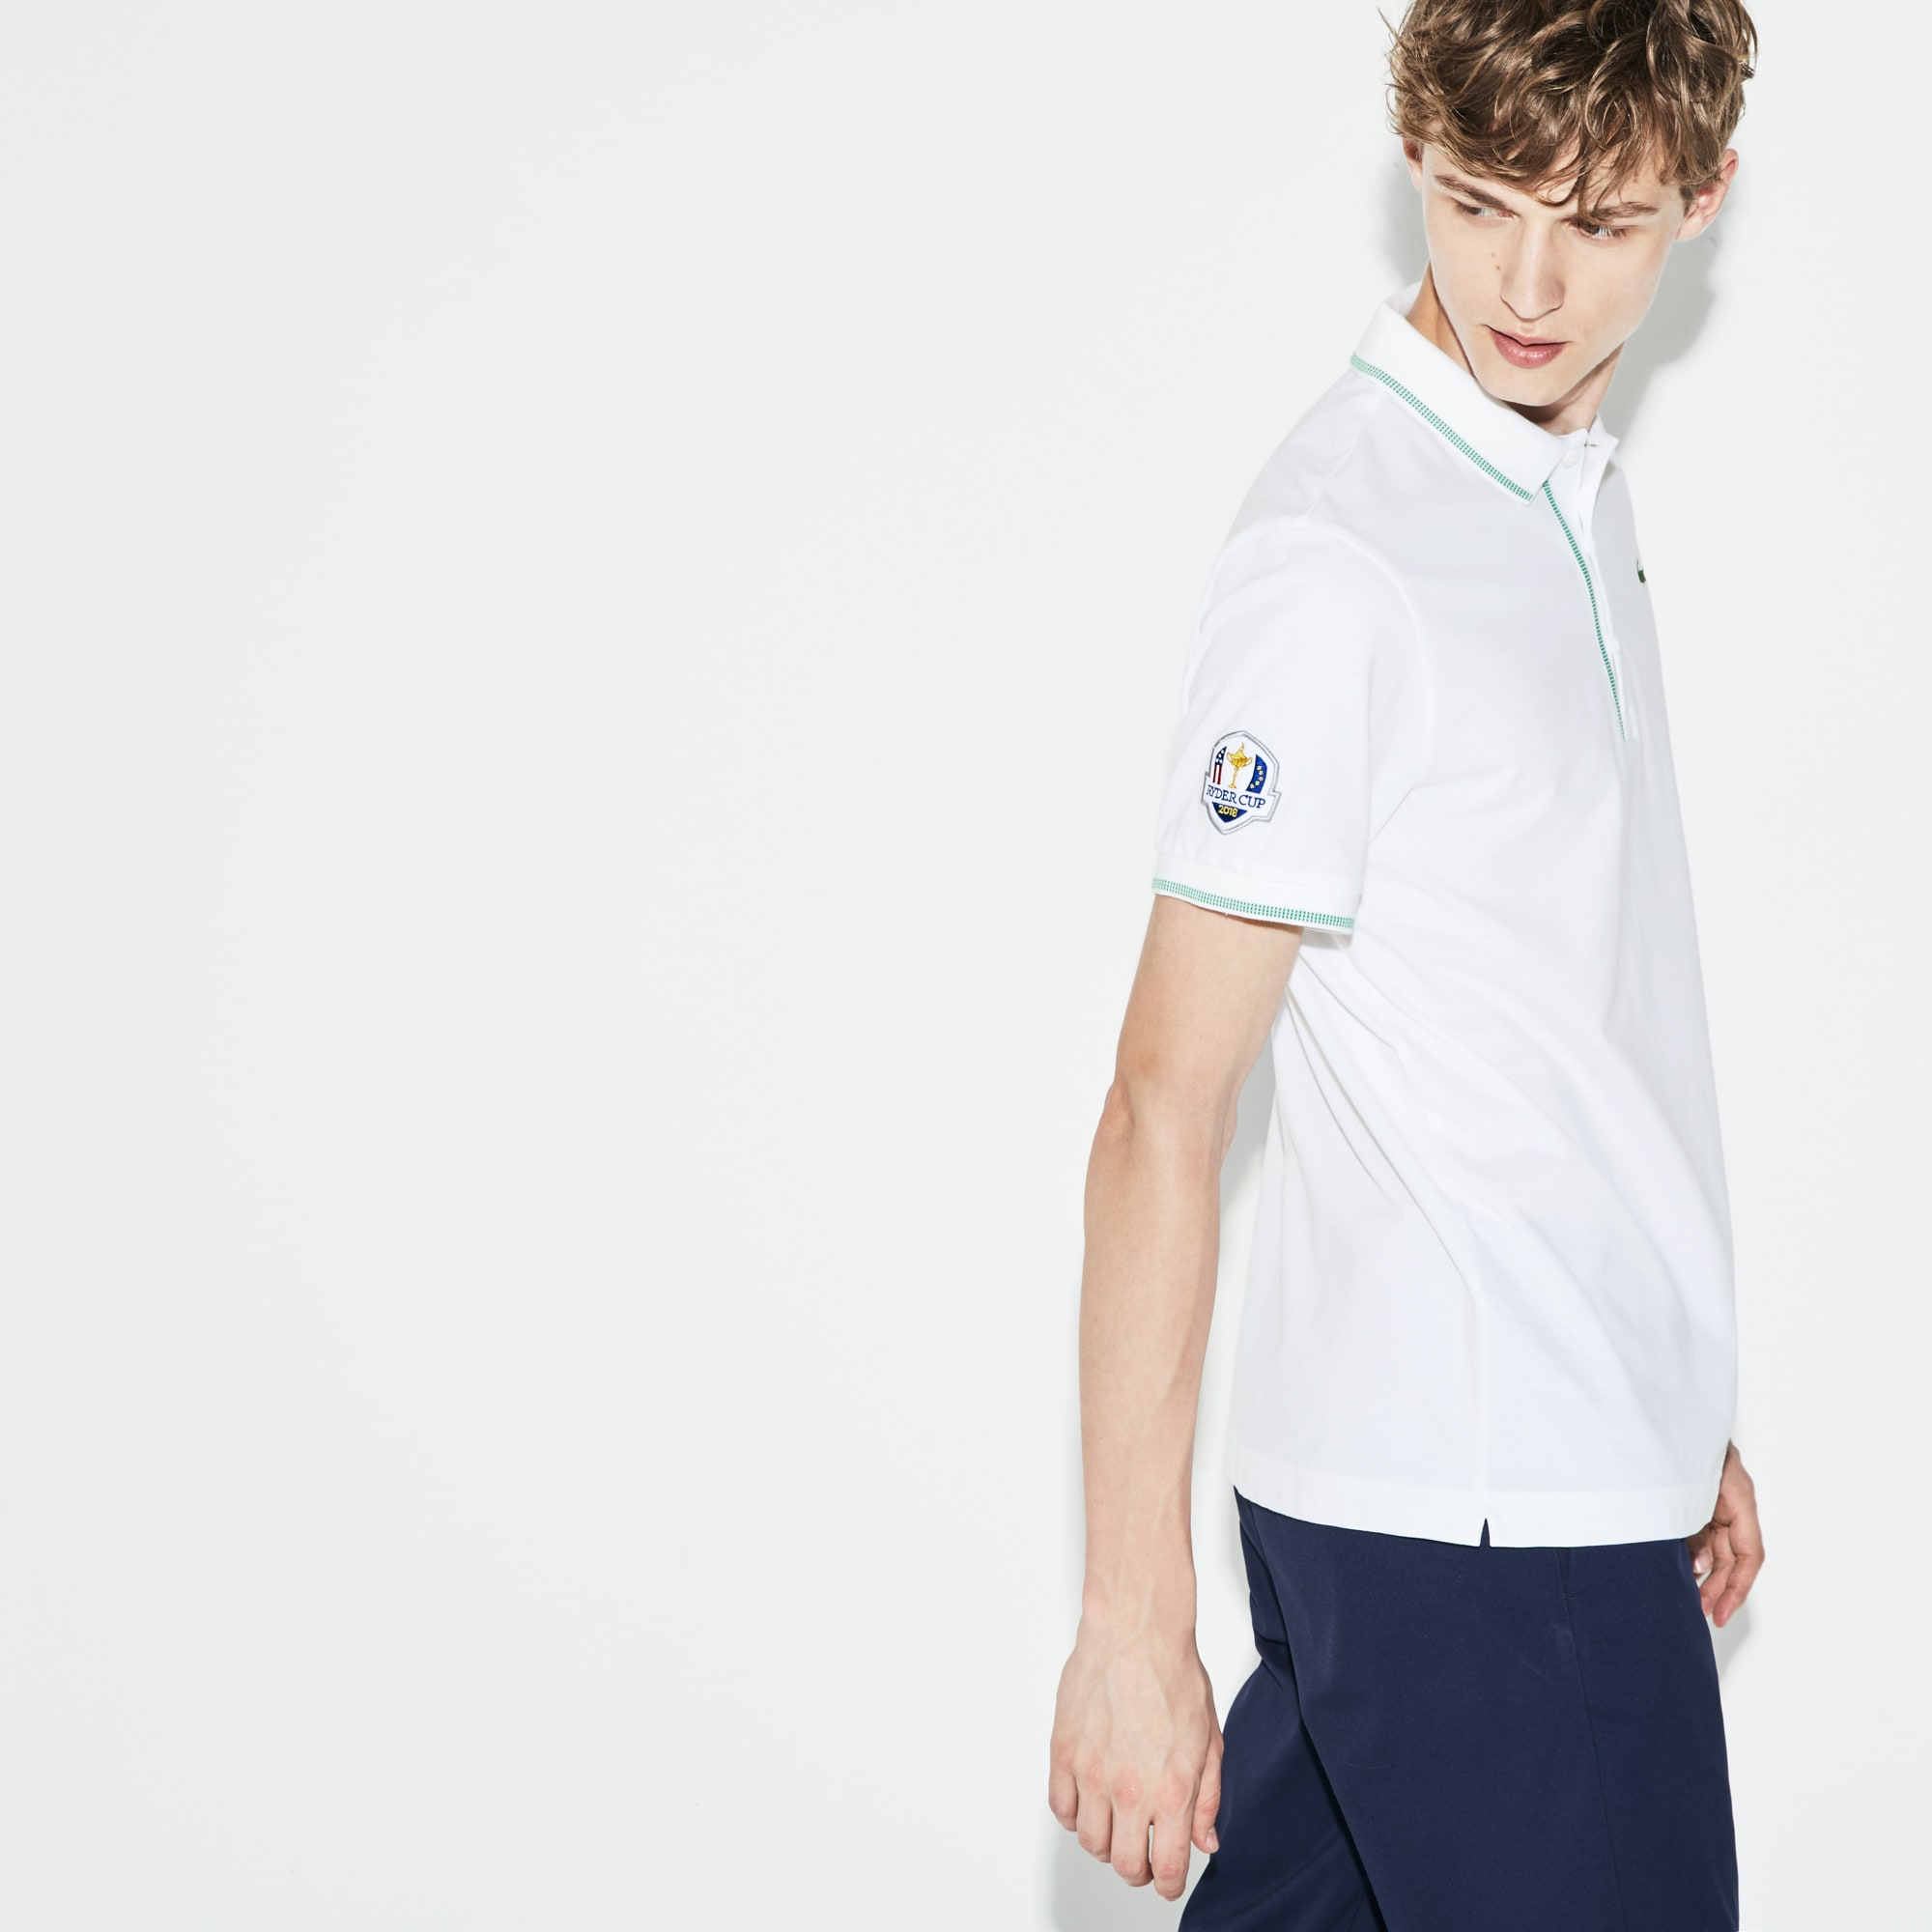 Lacoste - Herren LACOSTE SPORT Ryder Cup Edition Golf Poloshirt mit Paspeln - 2